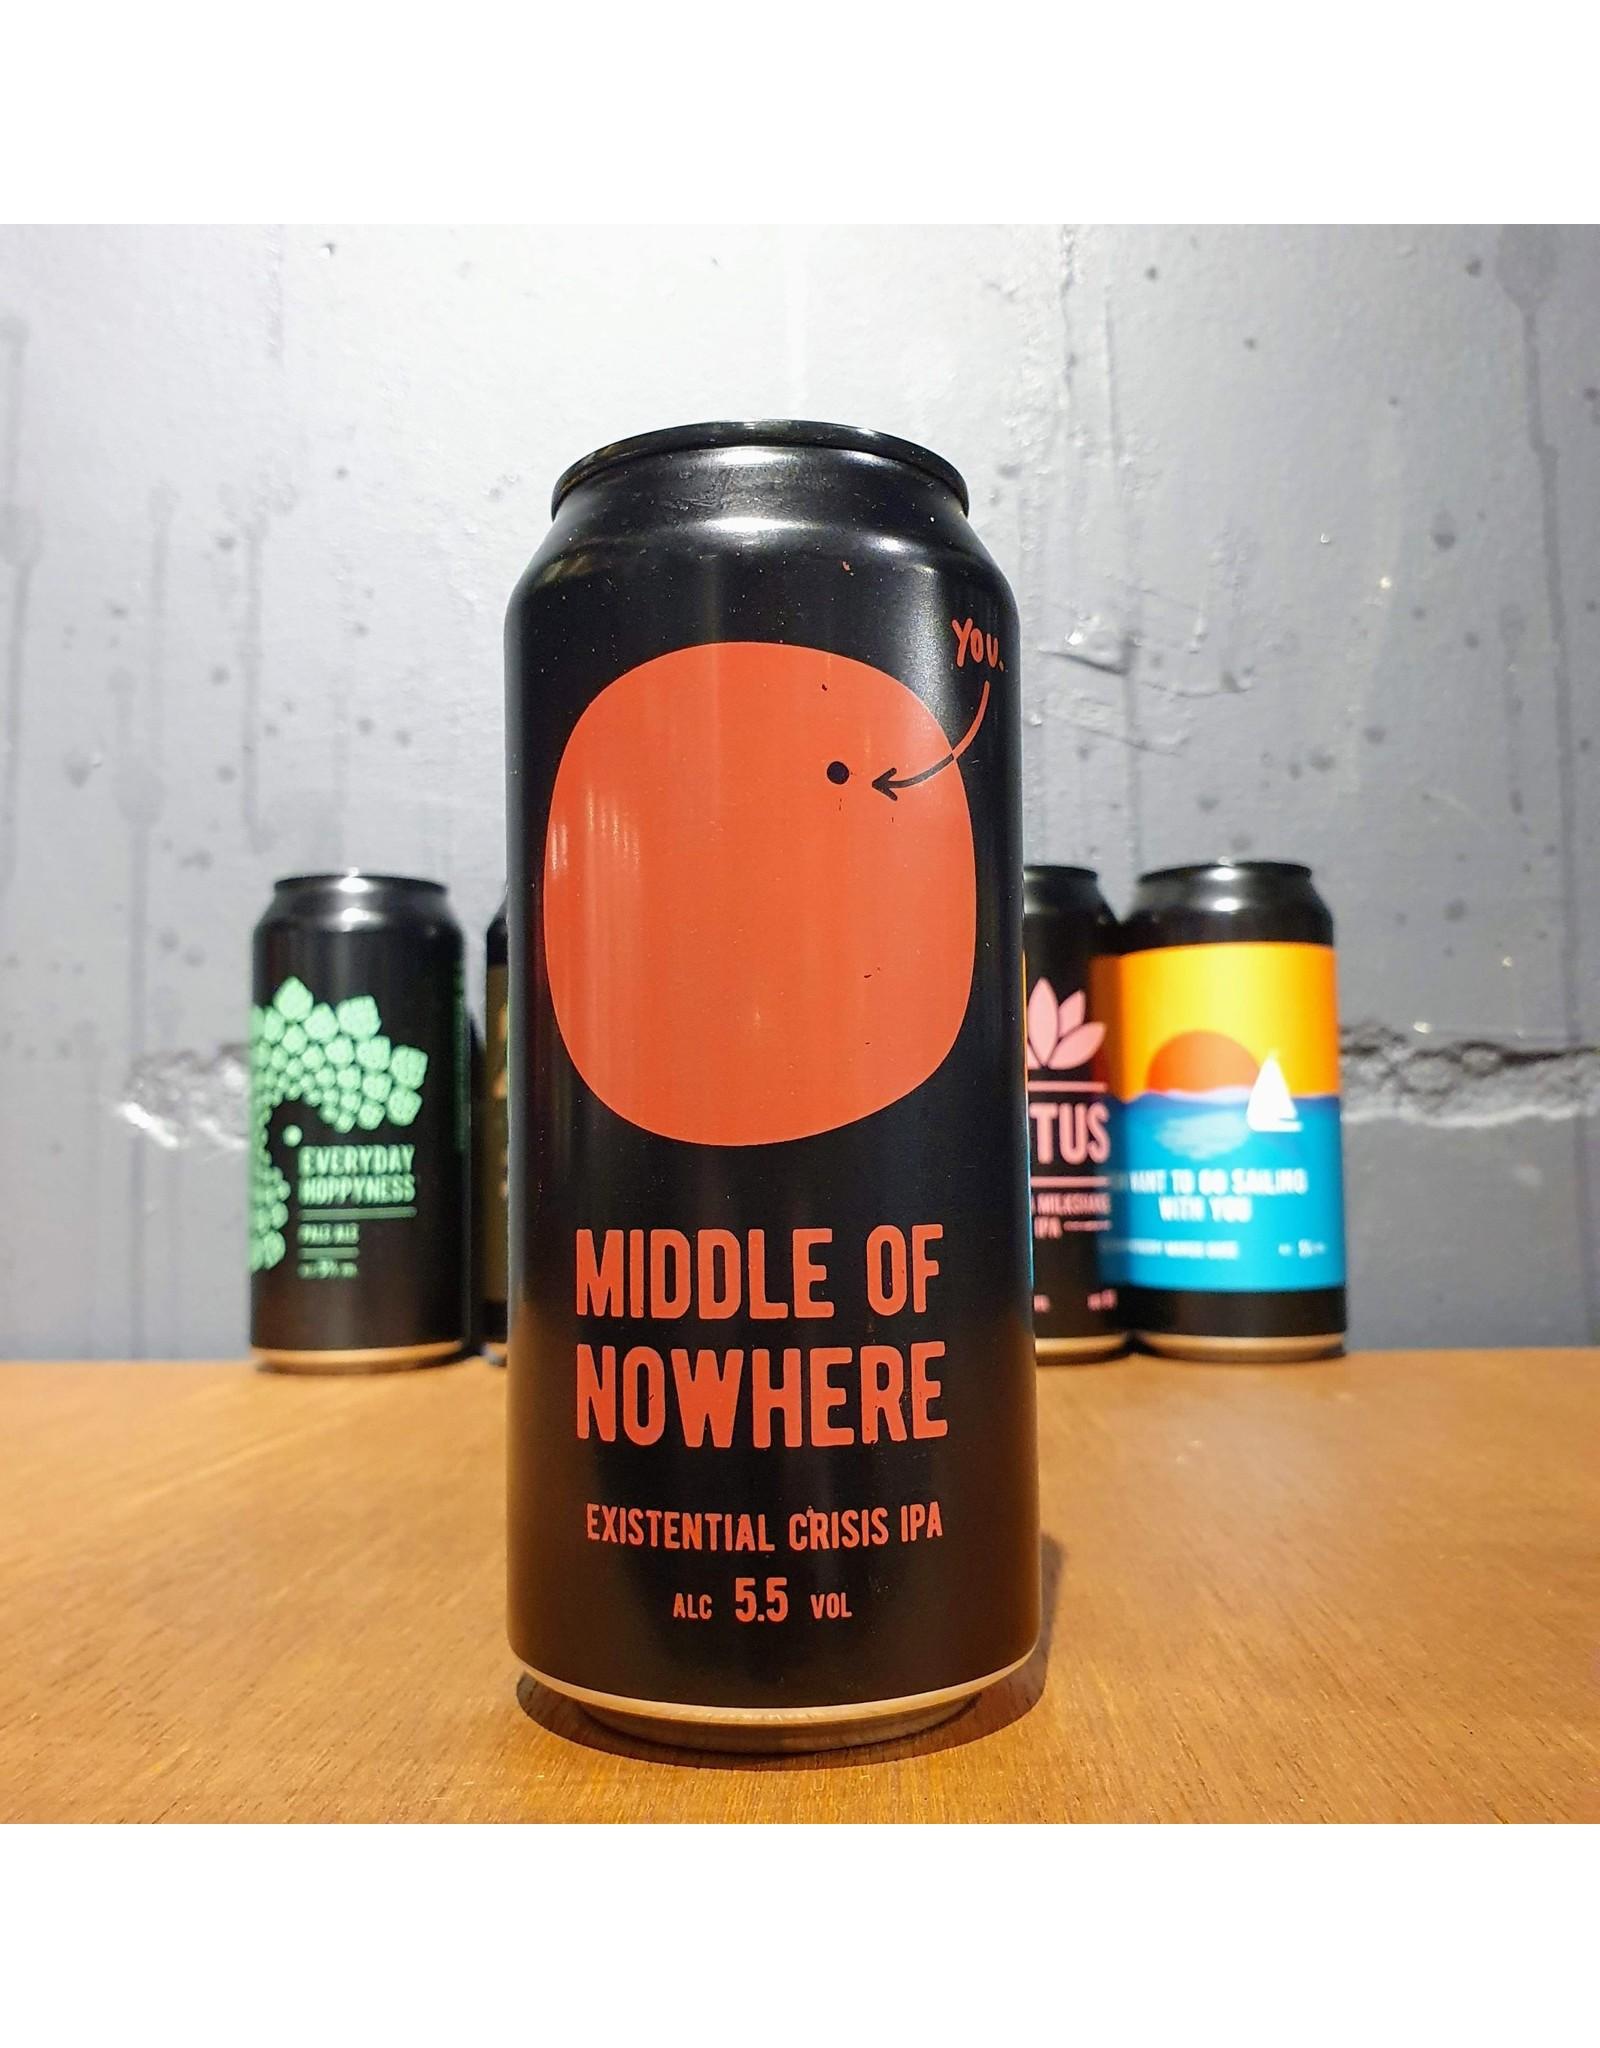 Reketye Brewing Co Reketye - Middle of nowhere